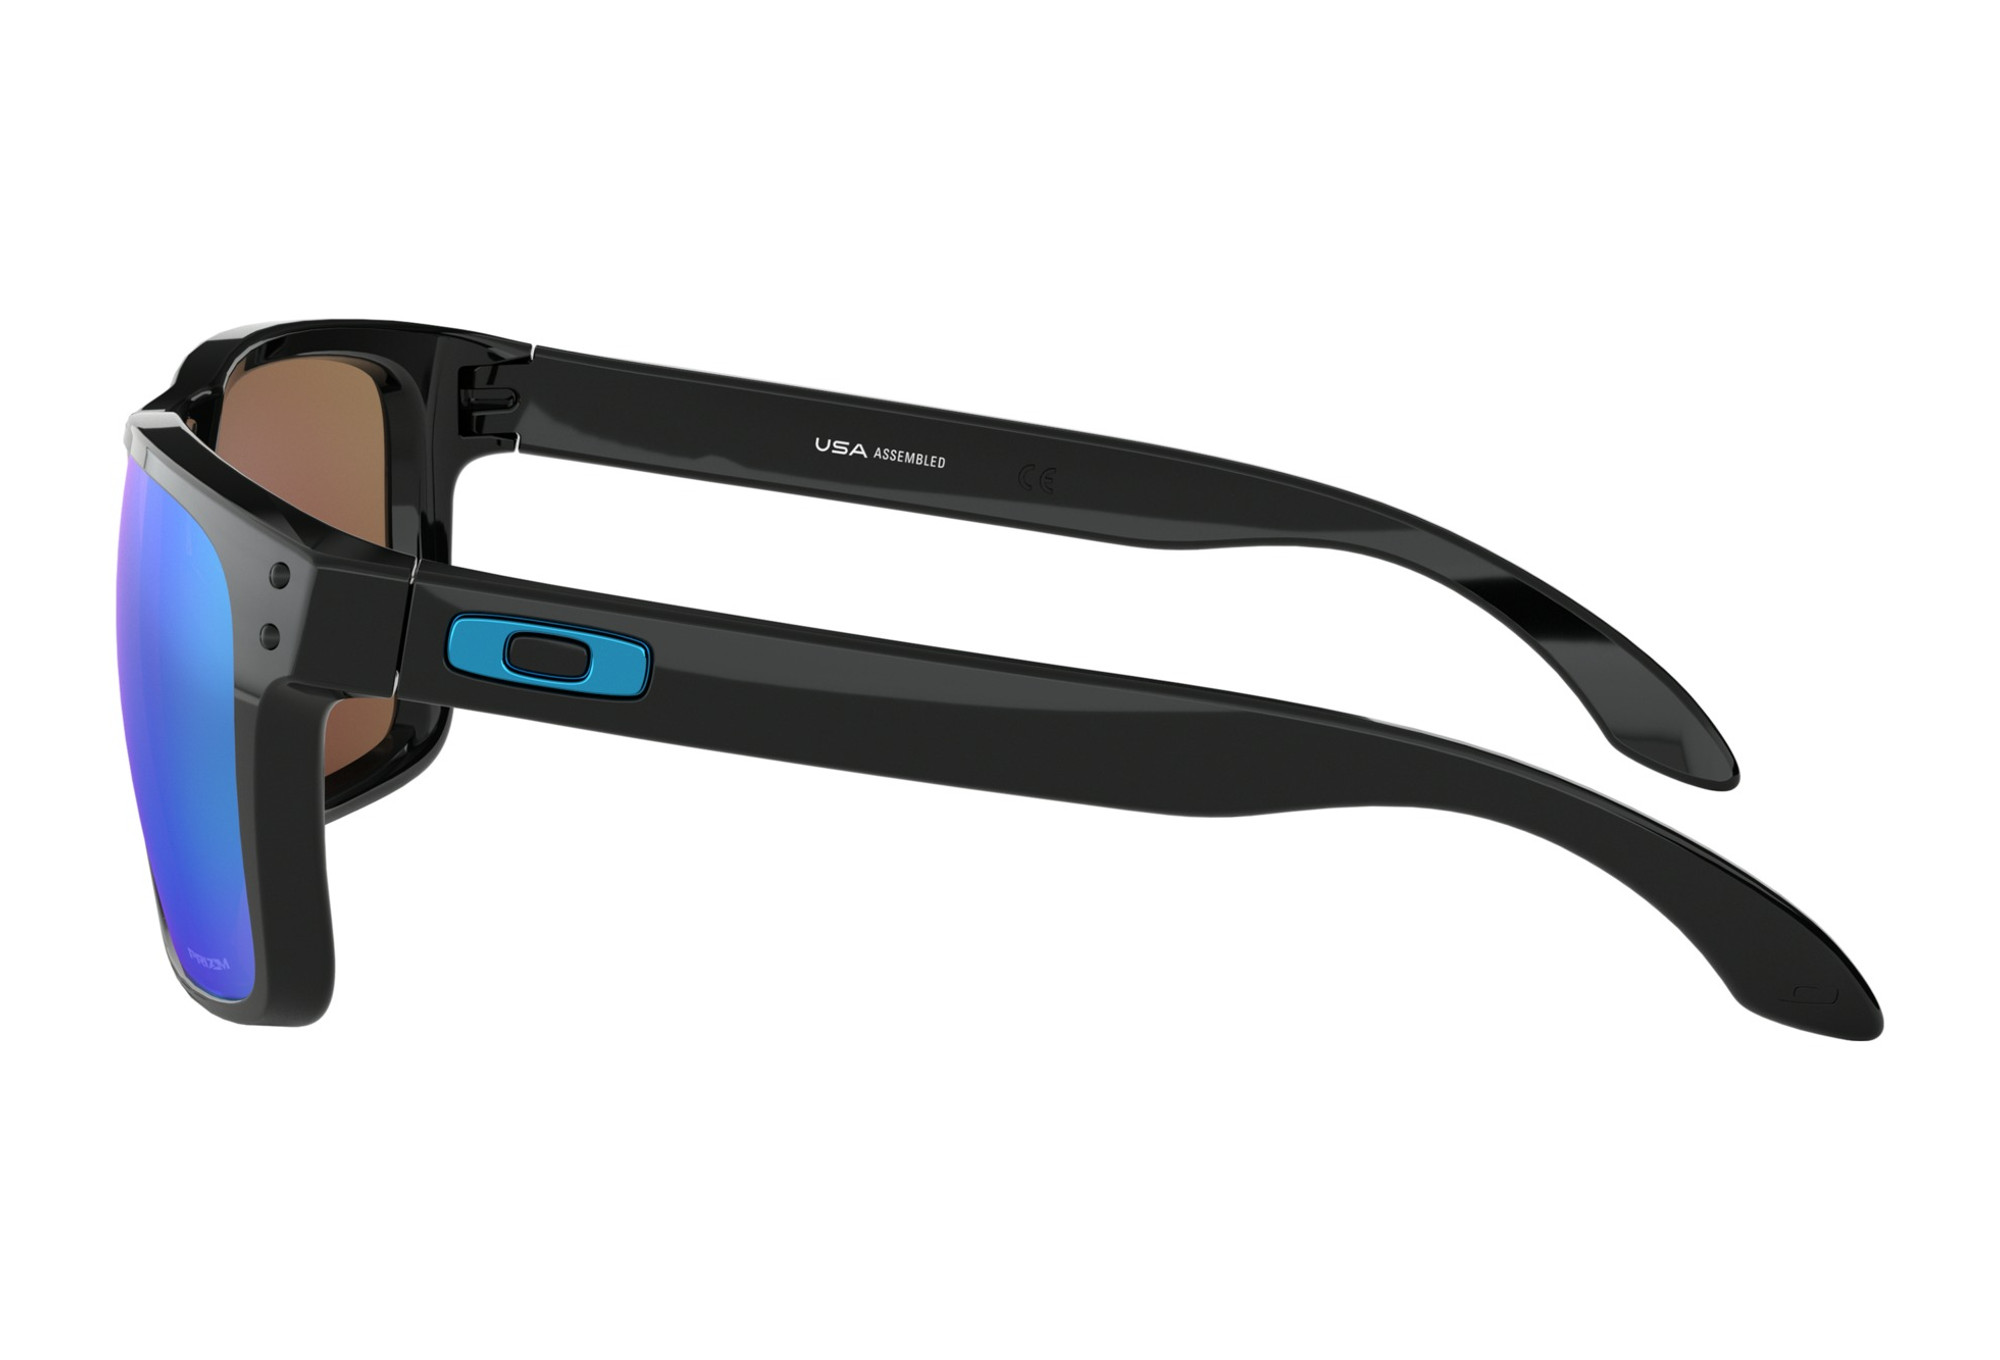 fb2a4a8f47c Oakley Holbrook XL Sunglasses Black - Prizm Sapphire OO9417-0359 ...